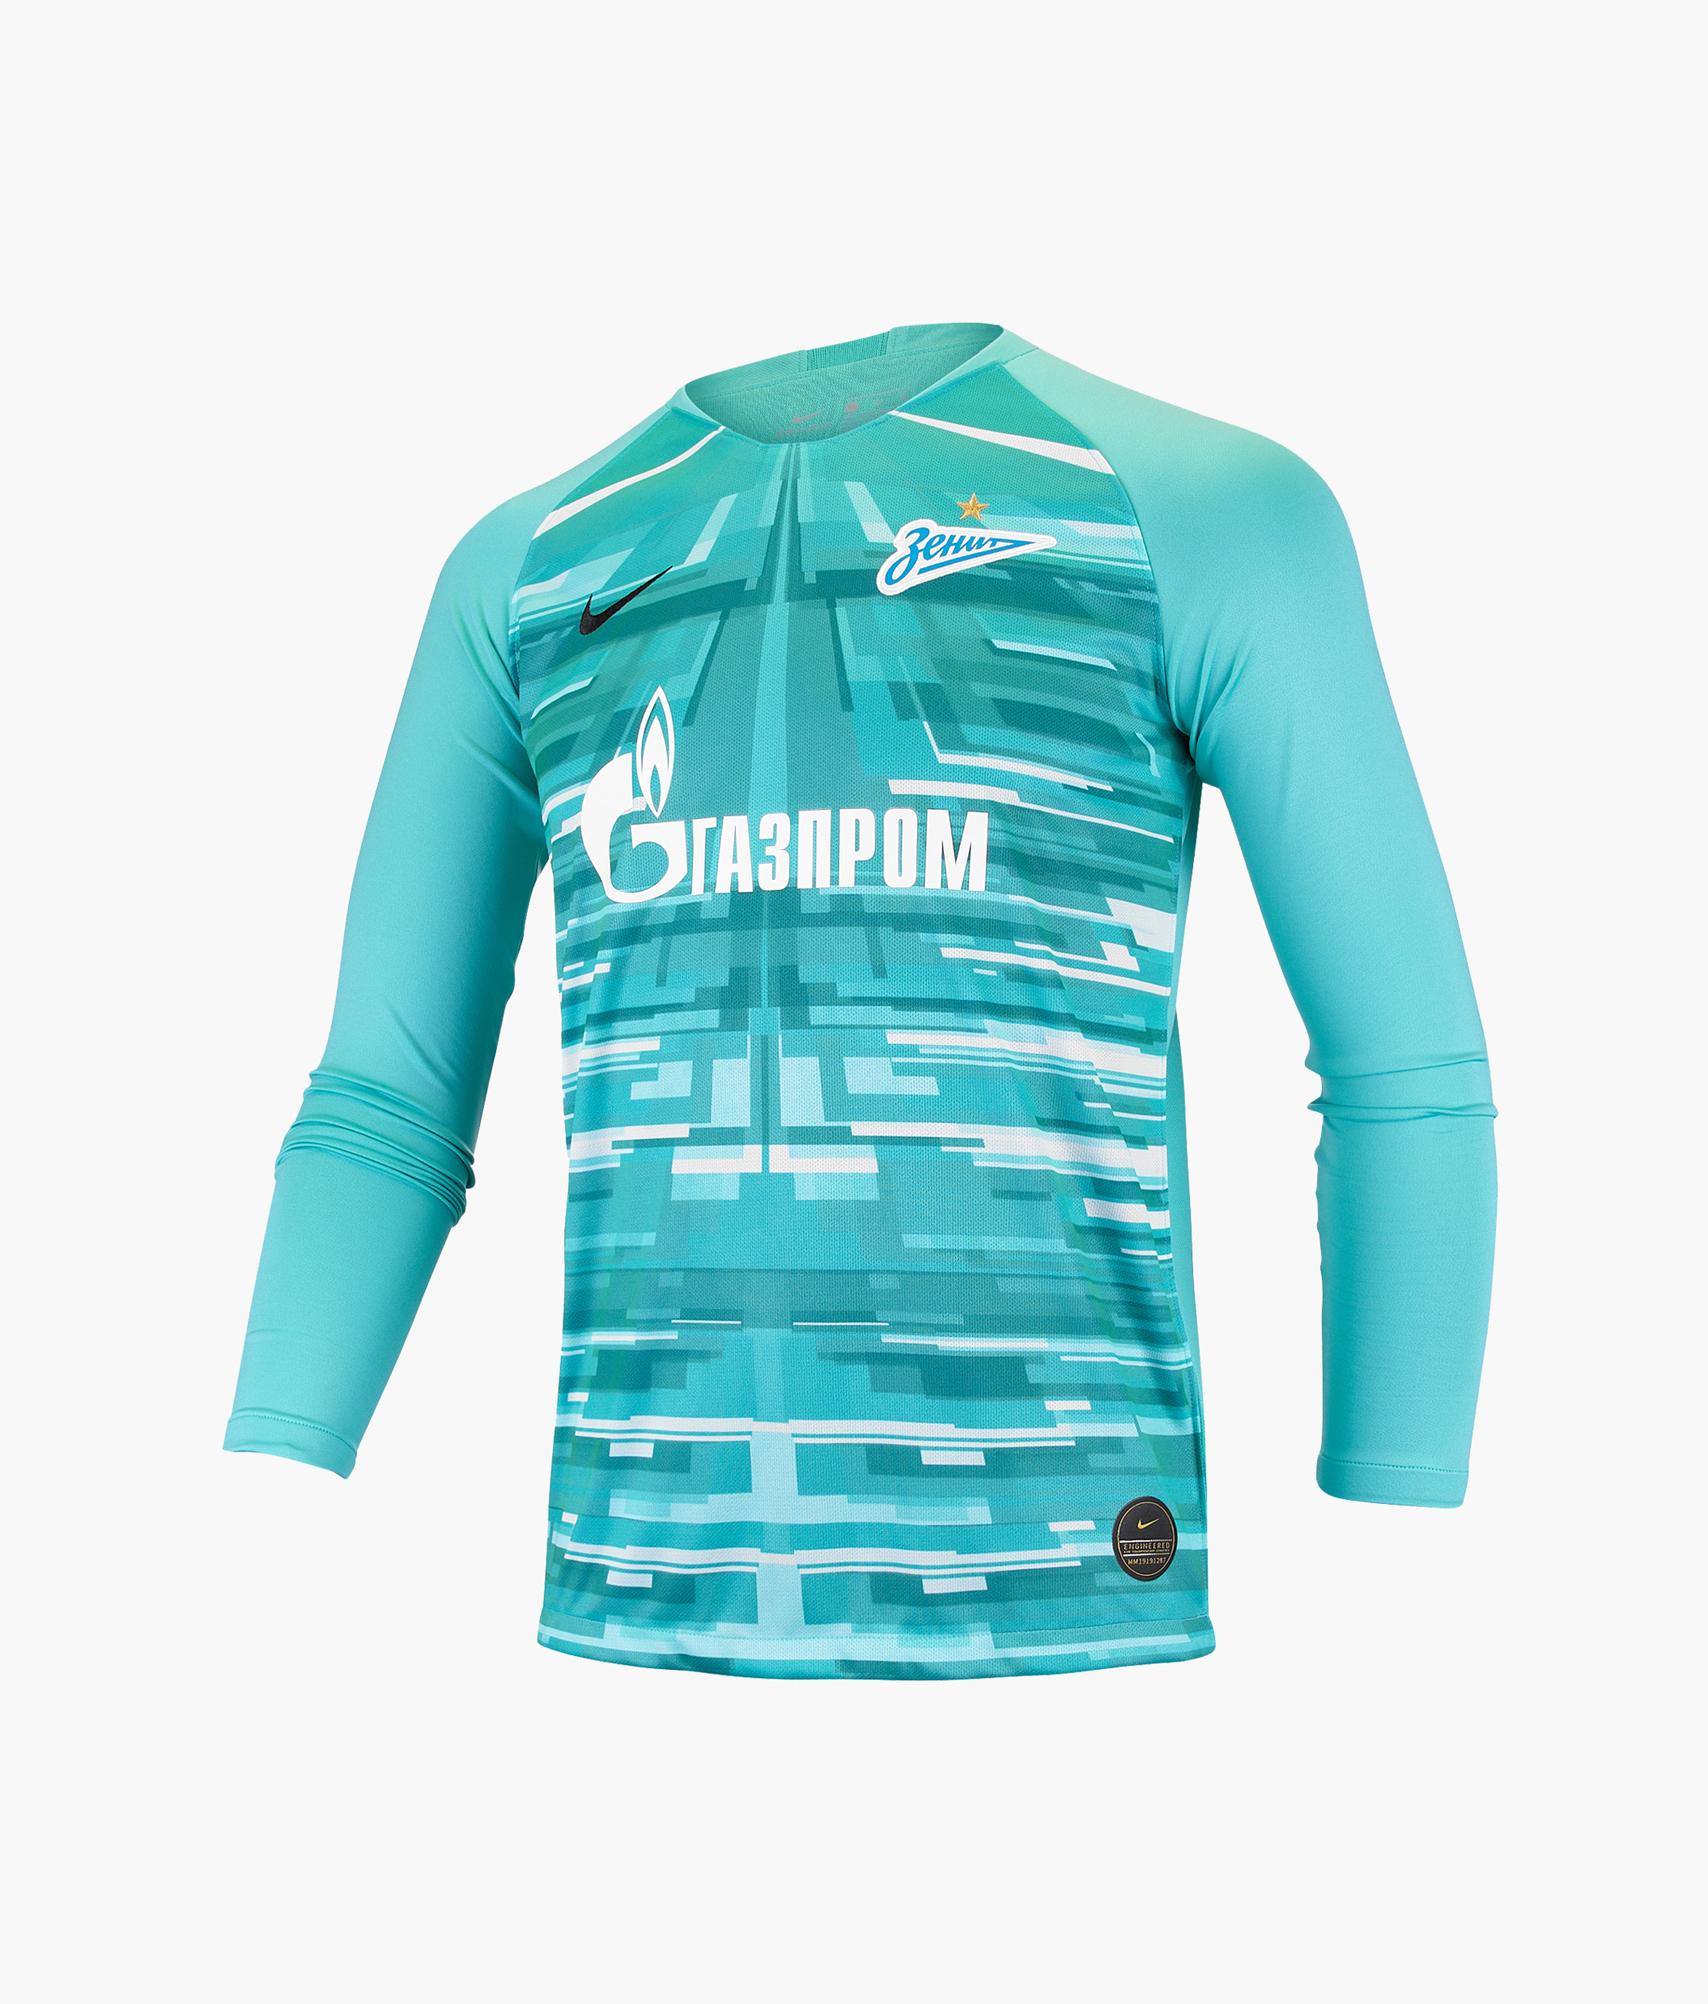 Футболка вратарская подростковая сезона 2019/20 Nike Цвет-Зеленый